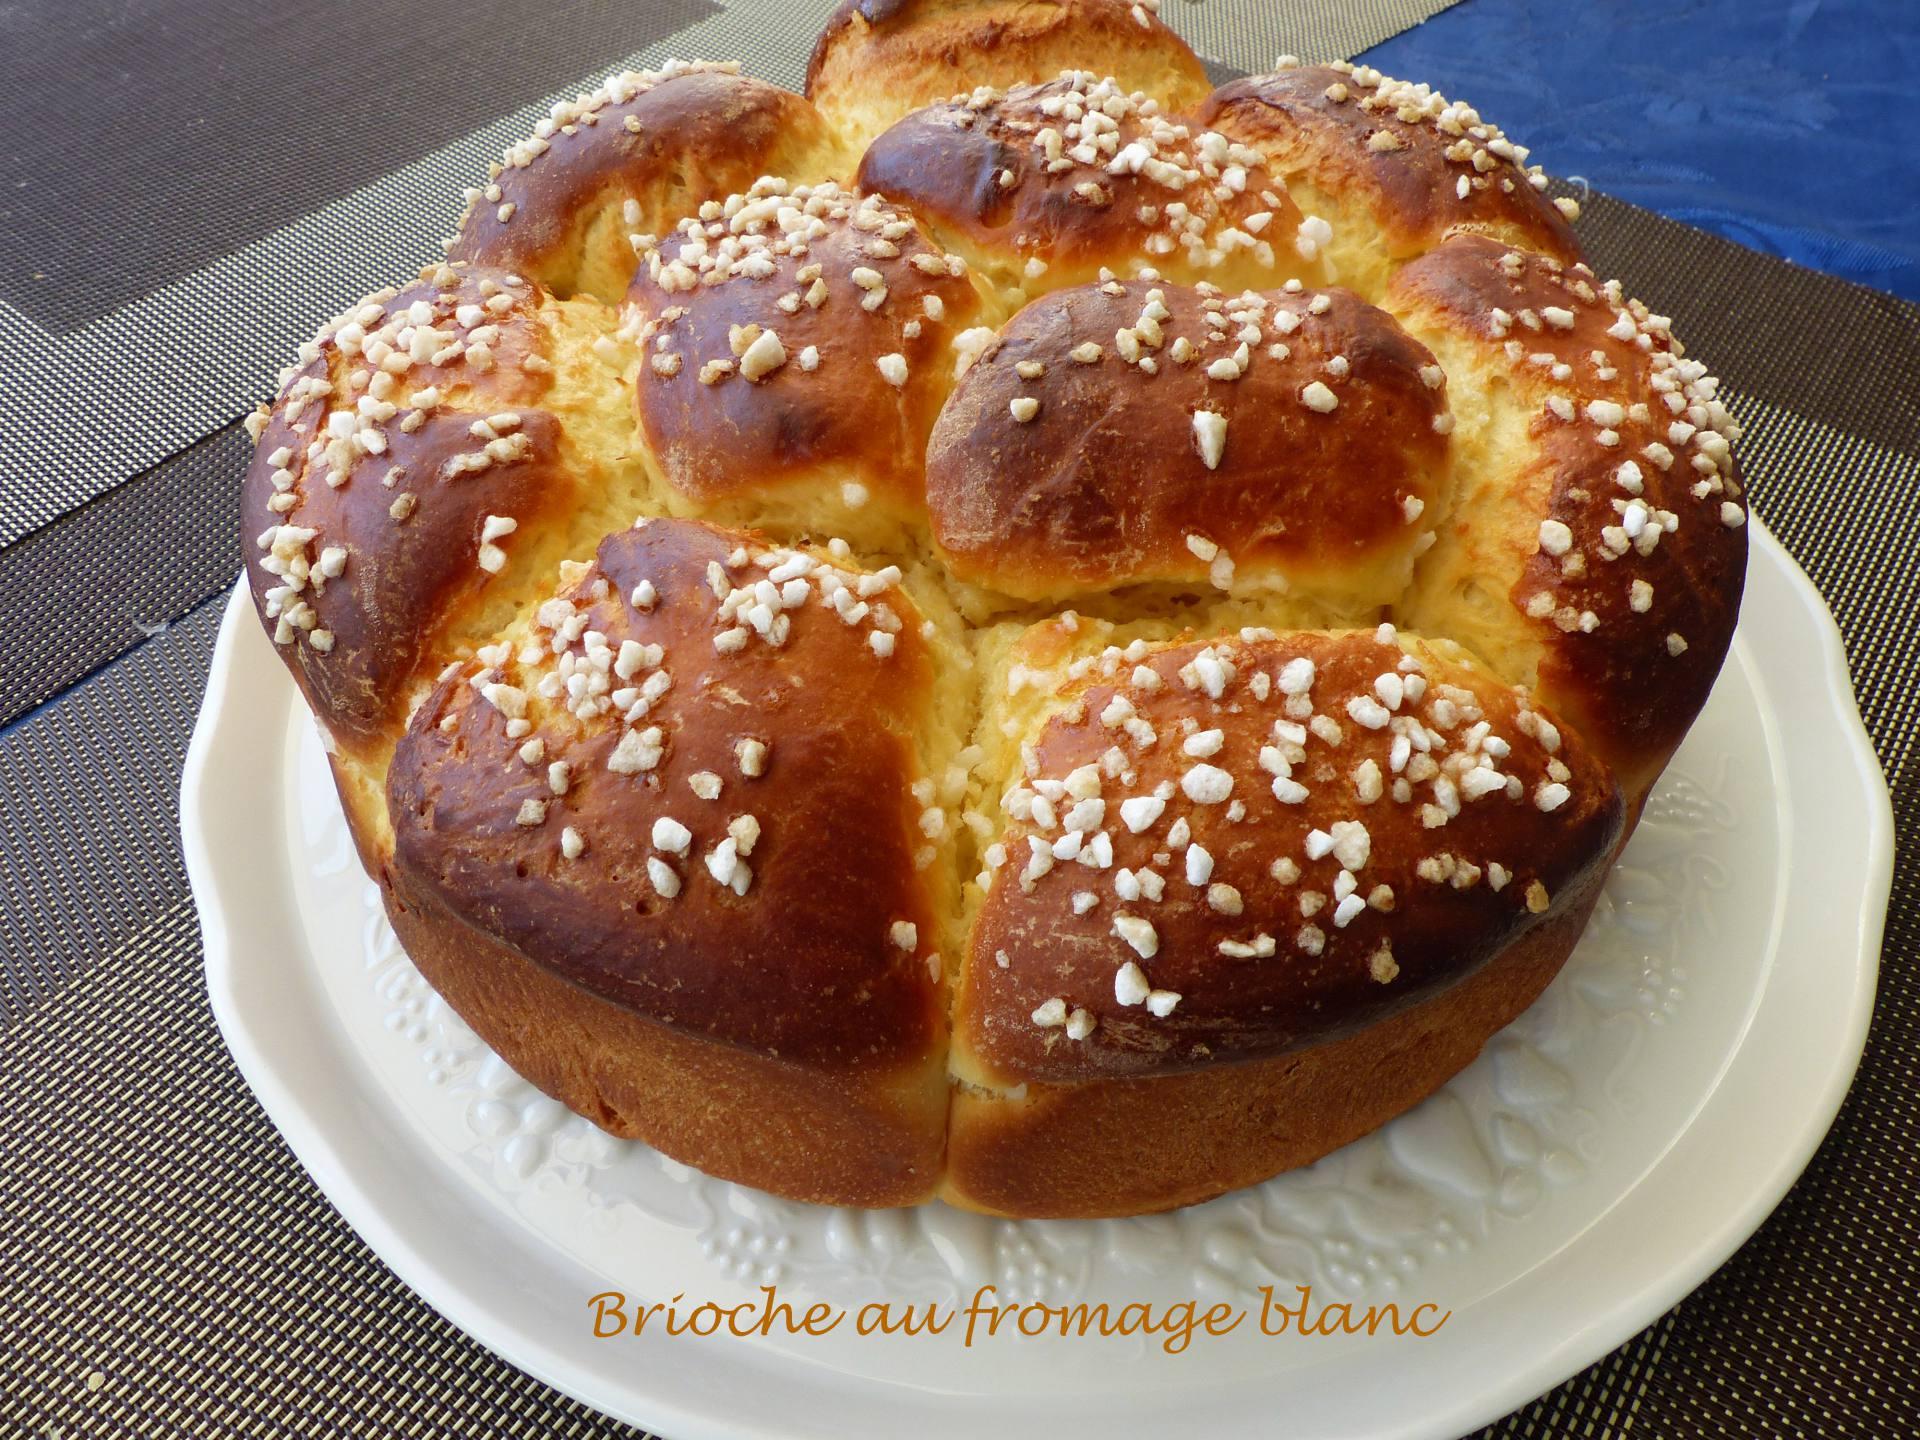 Brioche au fromage blanc P1190677 R